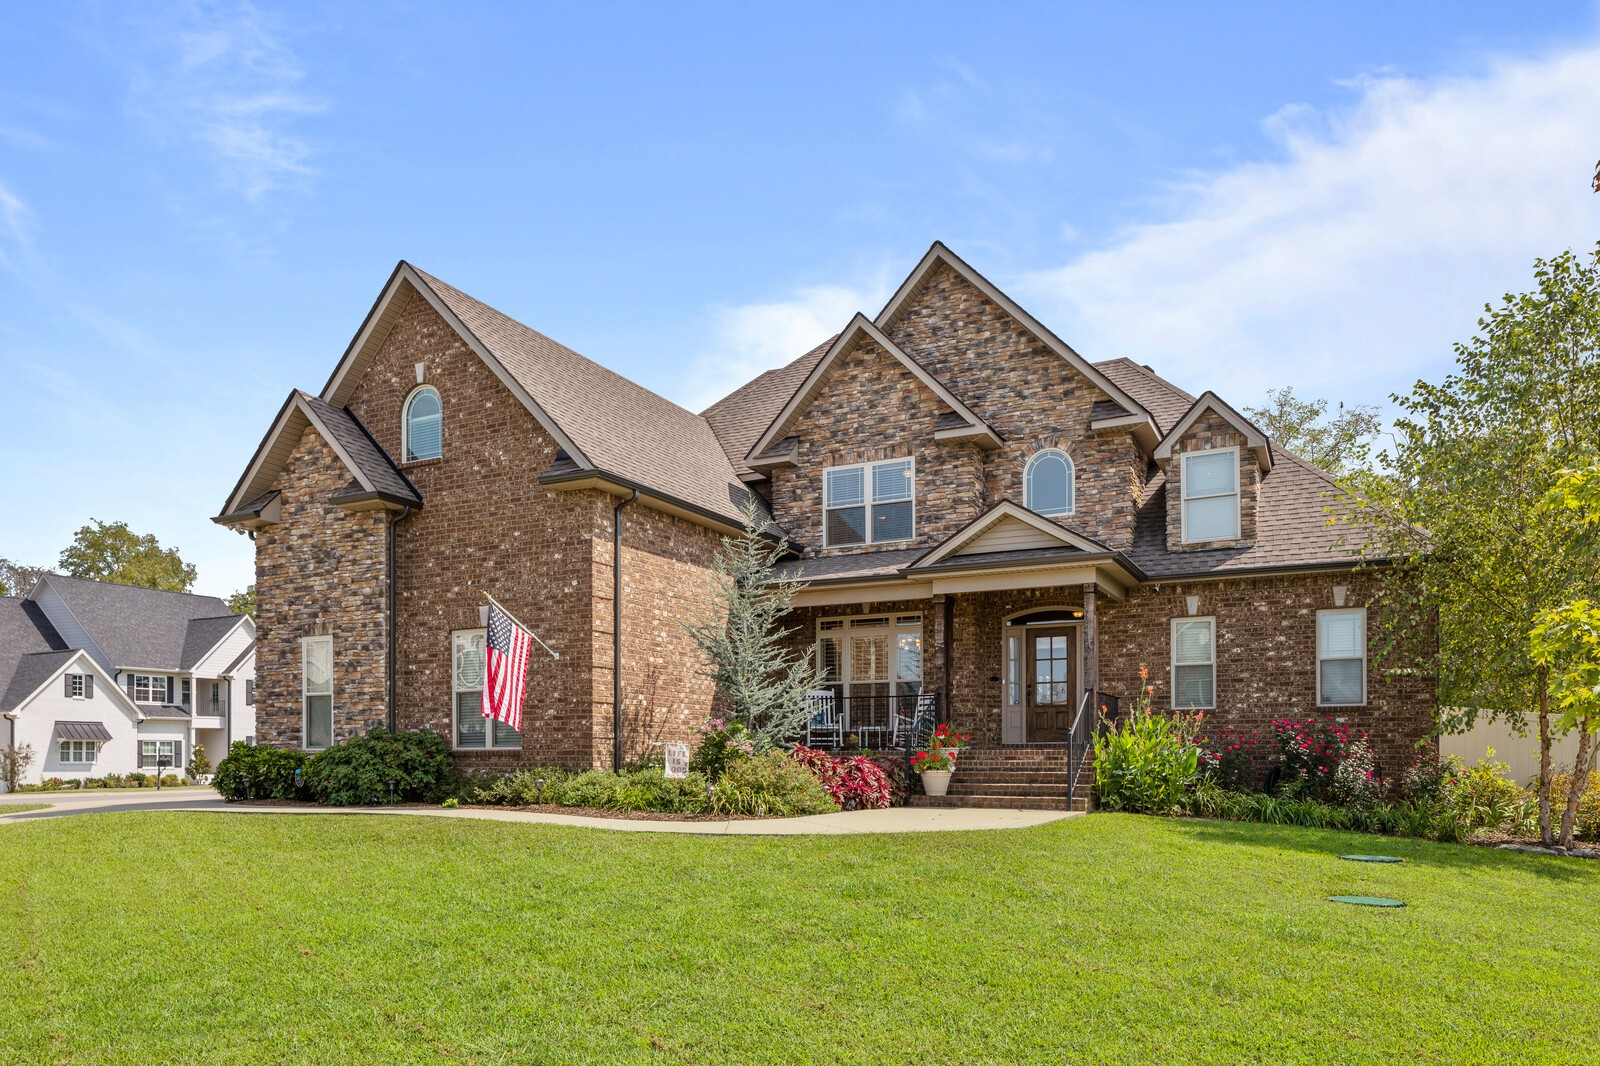 7338 Farmington Rd Property Photo - Lascassas, TN real estate listing